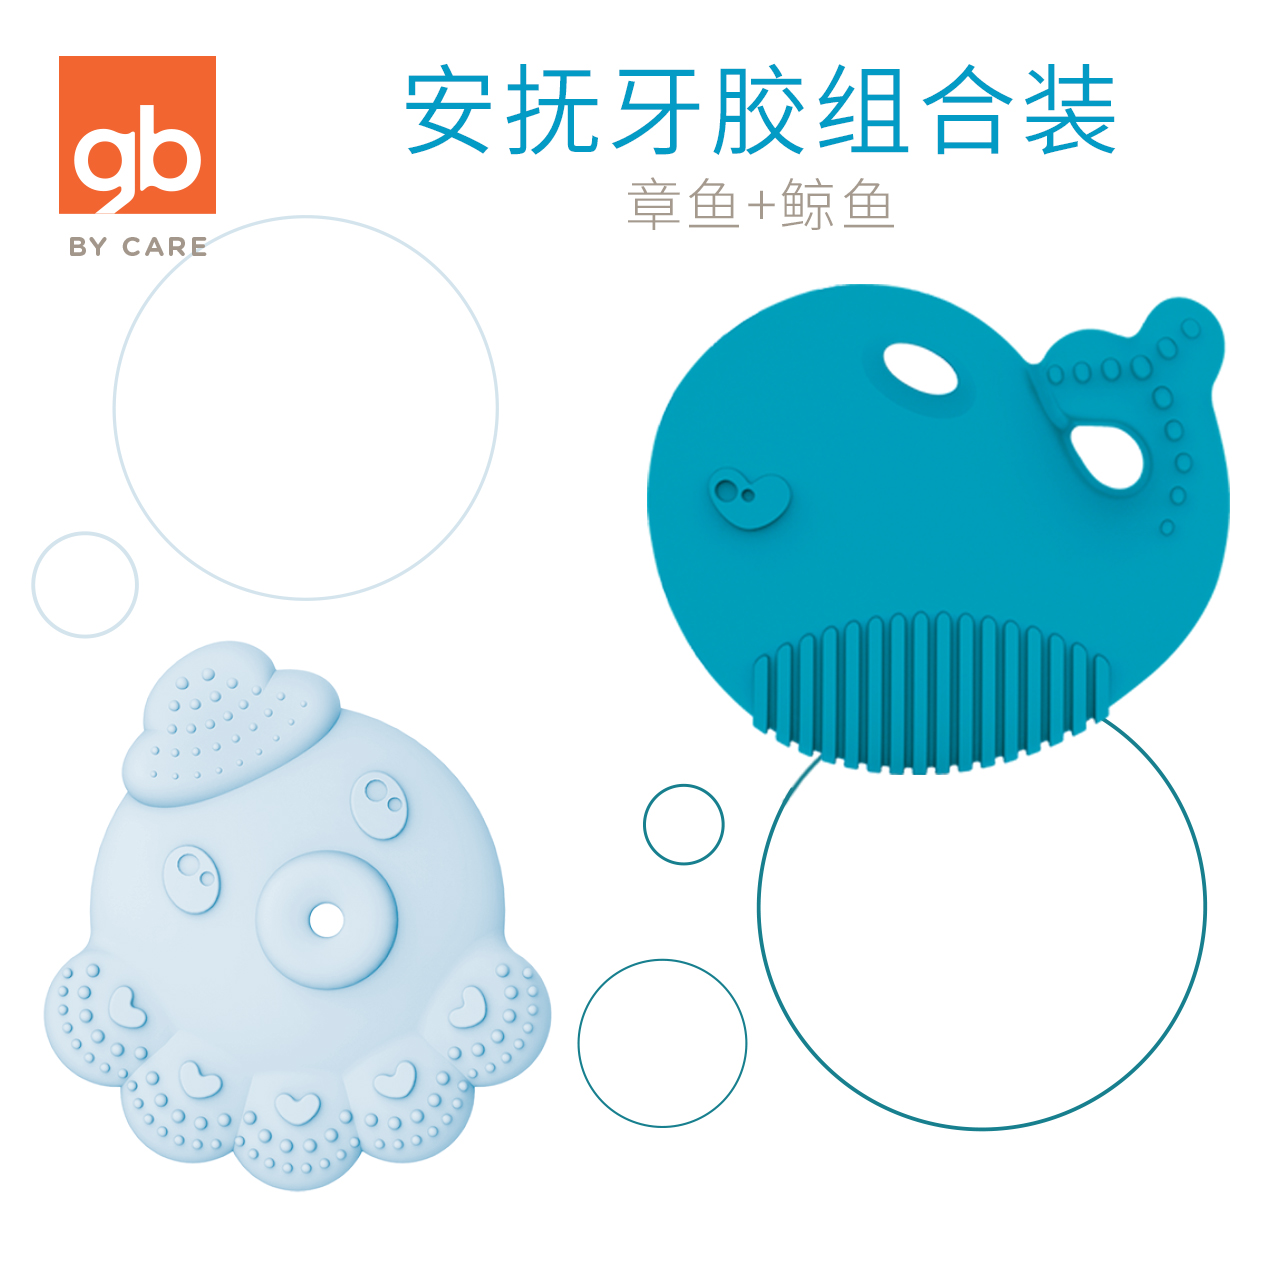 gb好孩子婴儿训练牙胶 宝宝磨牙棒婴儿玩具固齿器 硅胶无毒牙咬胶